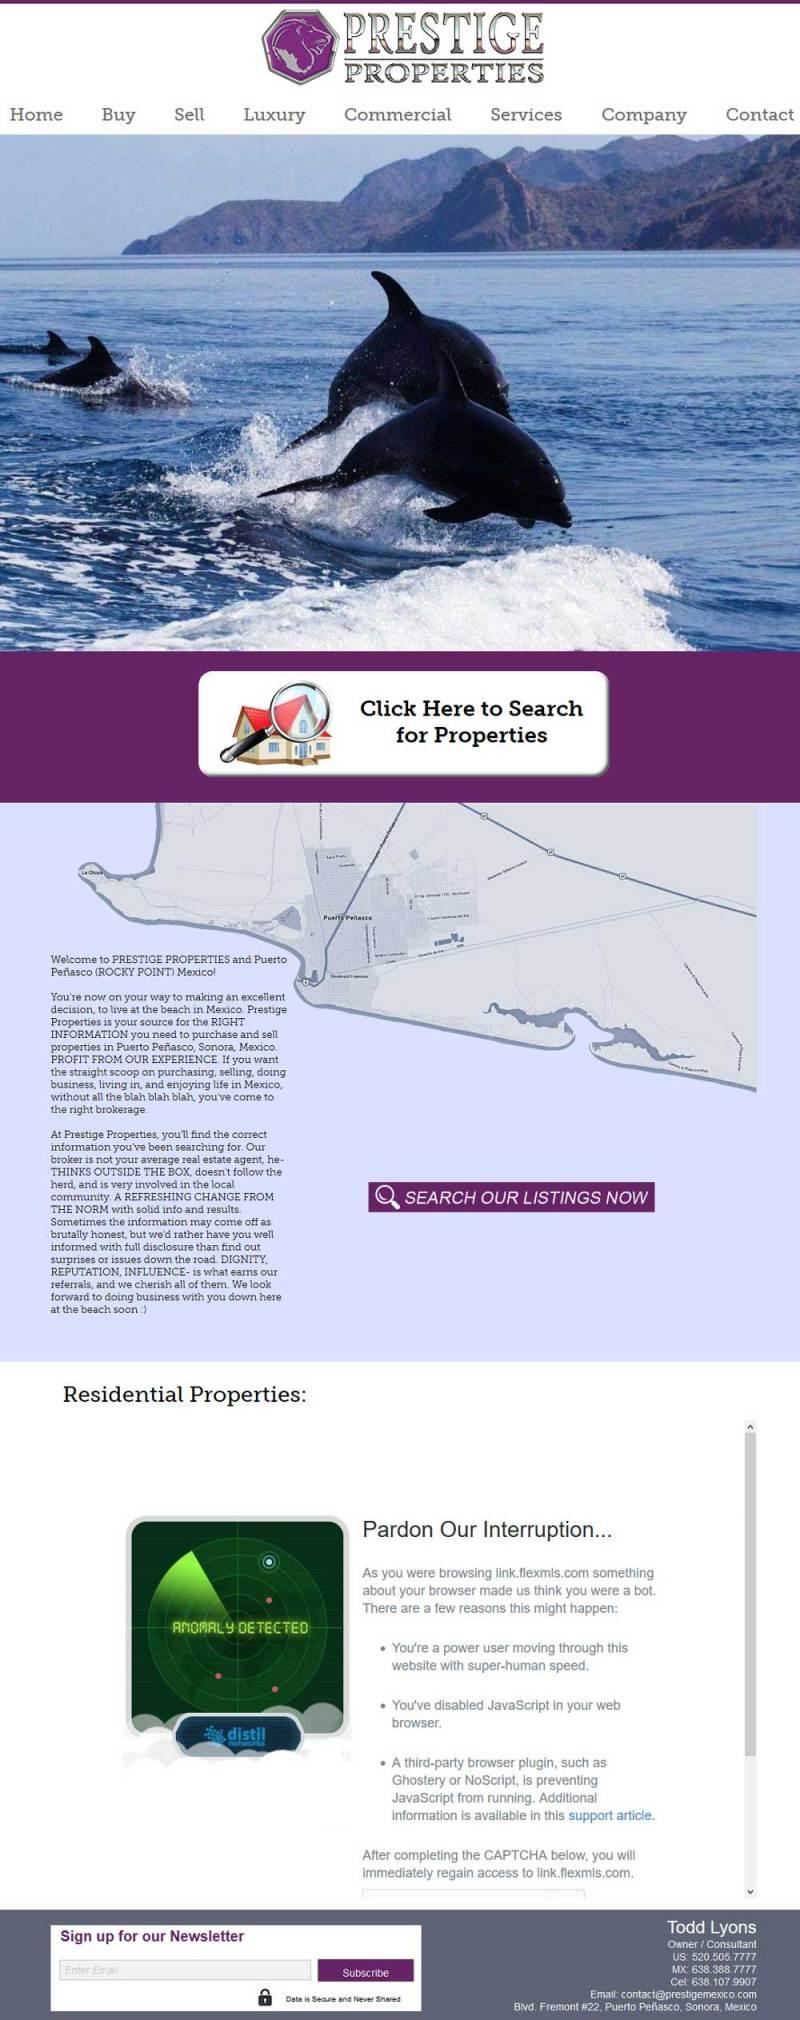 Prestige Properties Real Estate in Puerto Penasco (Rocky Point Mexico). Click here to visit Prestige Properties' website.